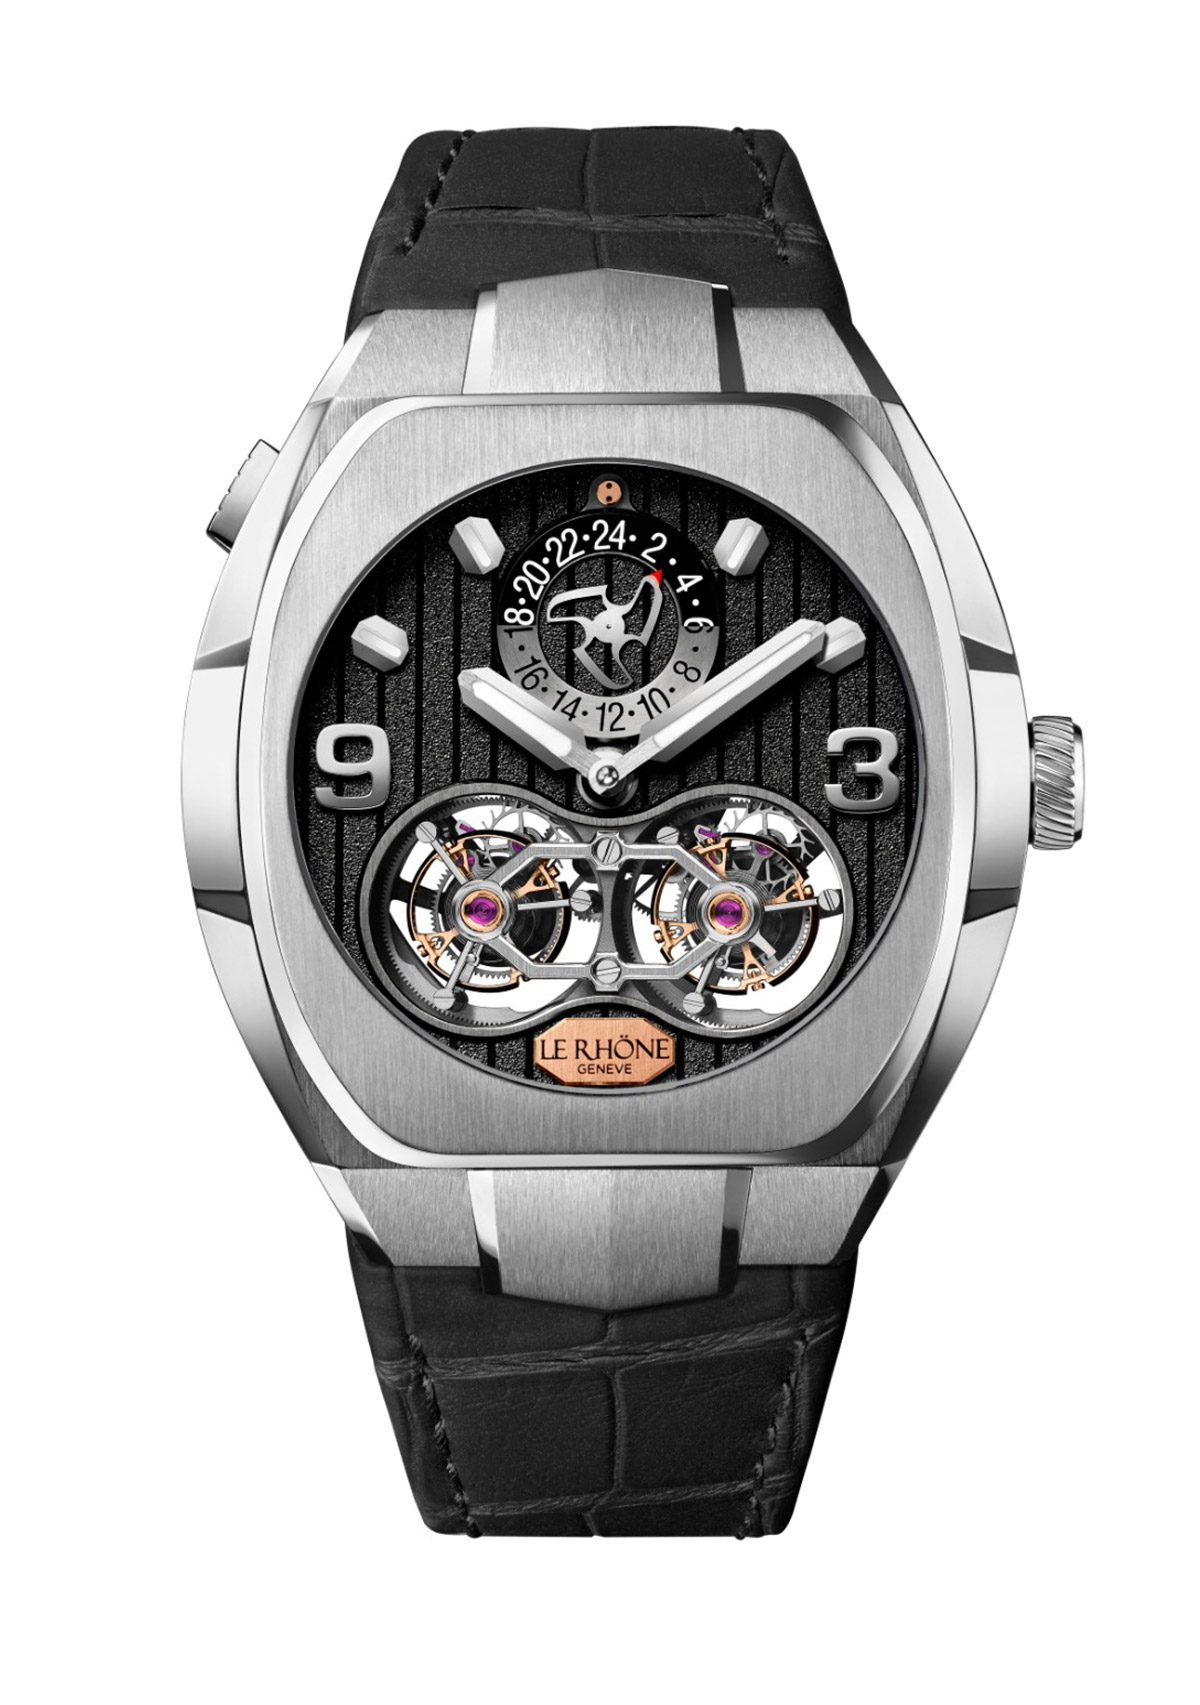 horology-le-rhone-watch-R2WG091U1-A99D